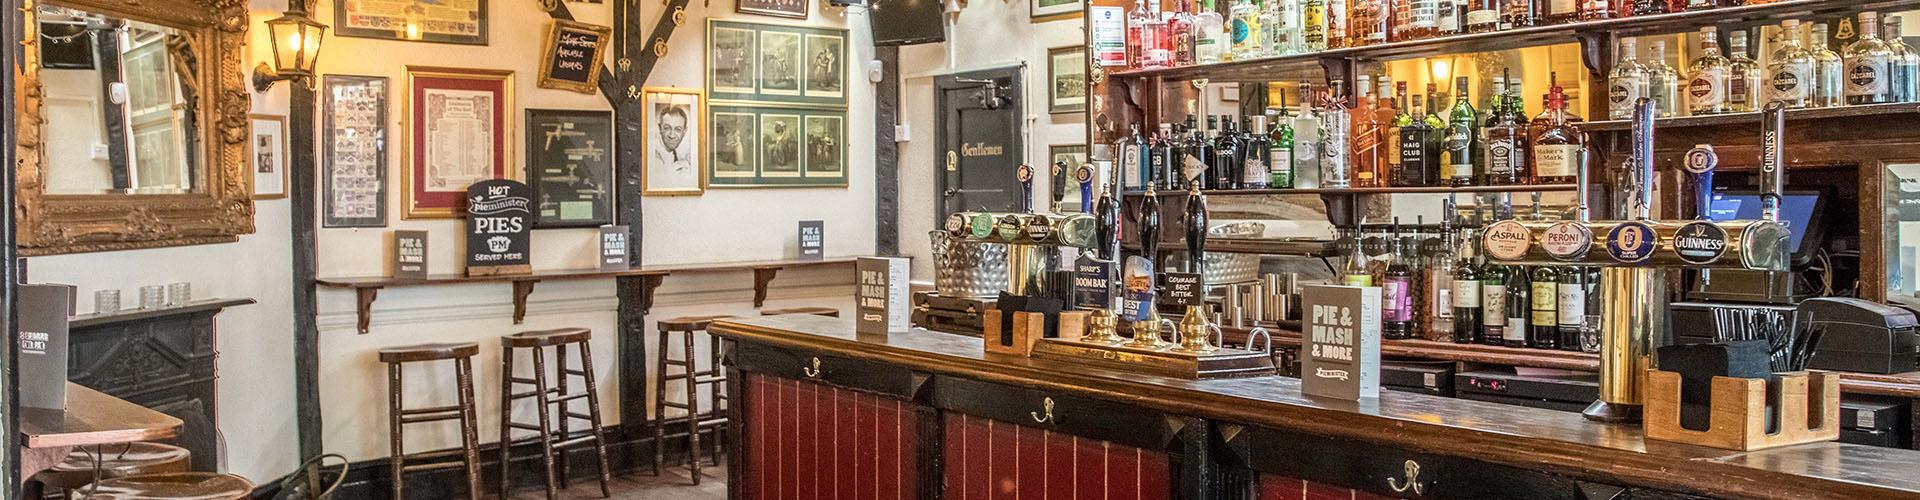 2020 - City Taverns - Bell London